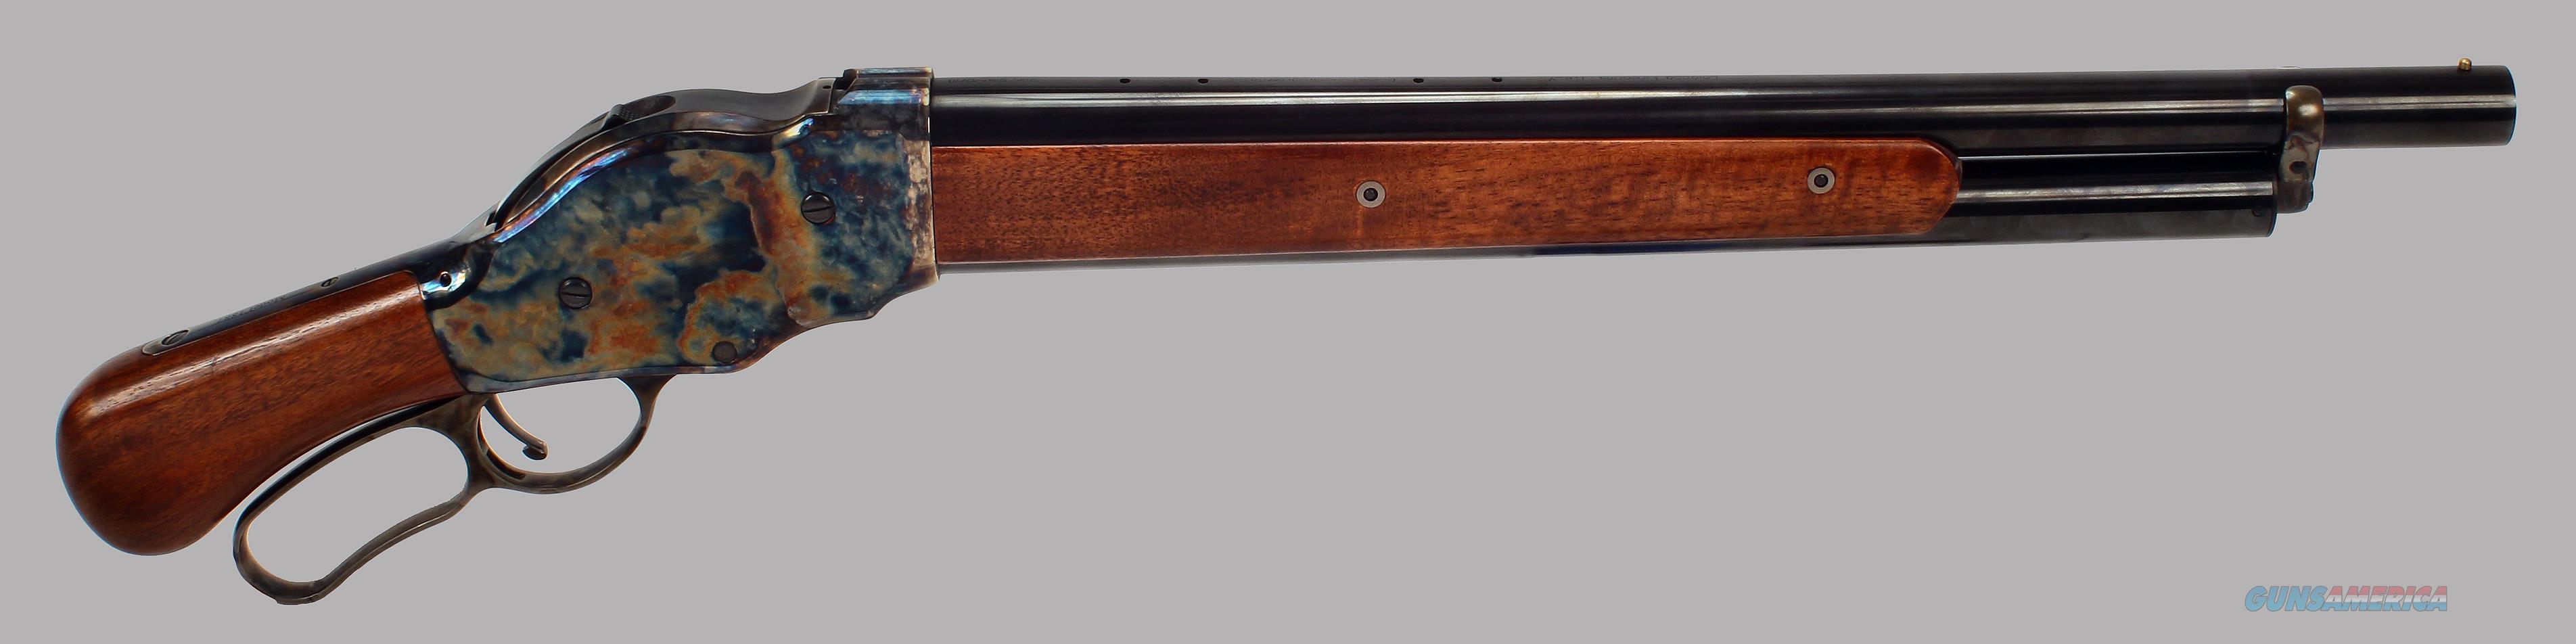 Chappa Model 1887 Lever Action 12ga Shotgun  Guns > Shotguns > Chiappa / Armi Sport Shotguns > 1887 Lever Shotgun